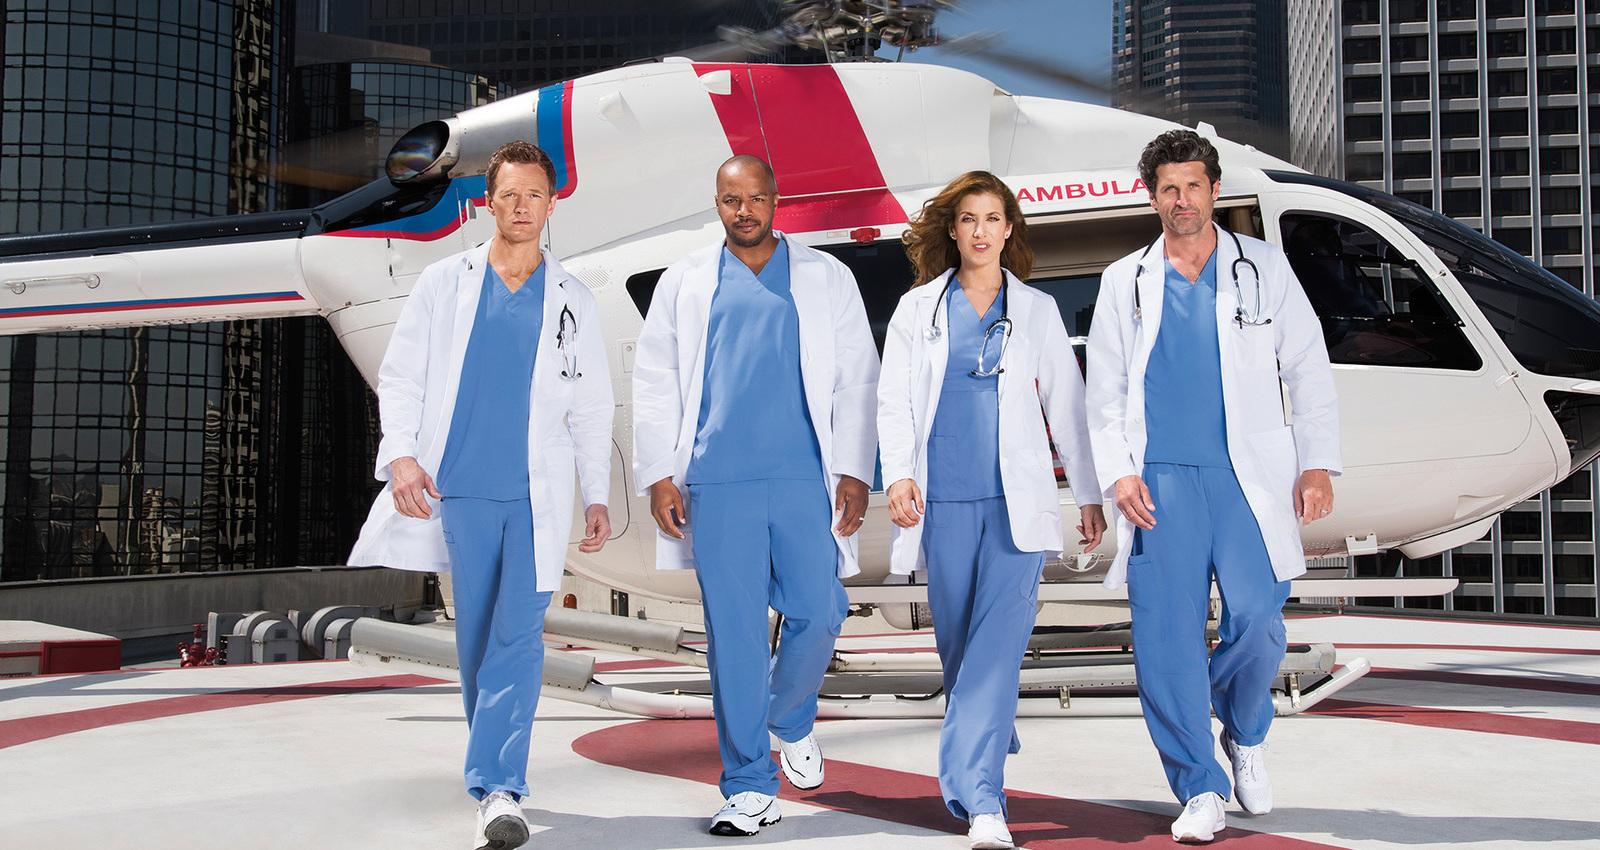 TV Doctors - Emergency